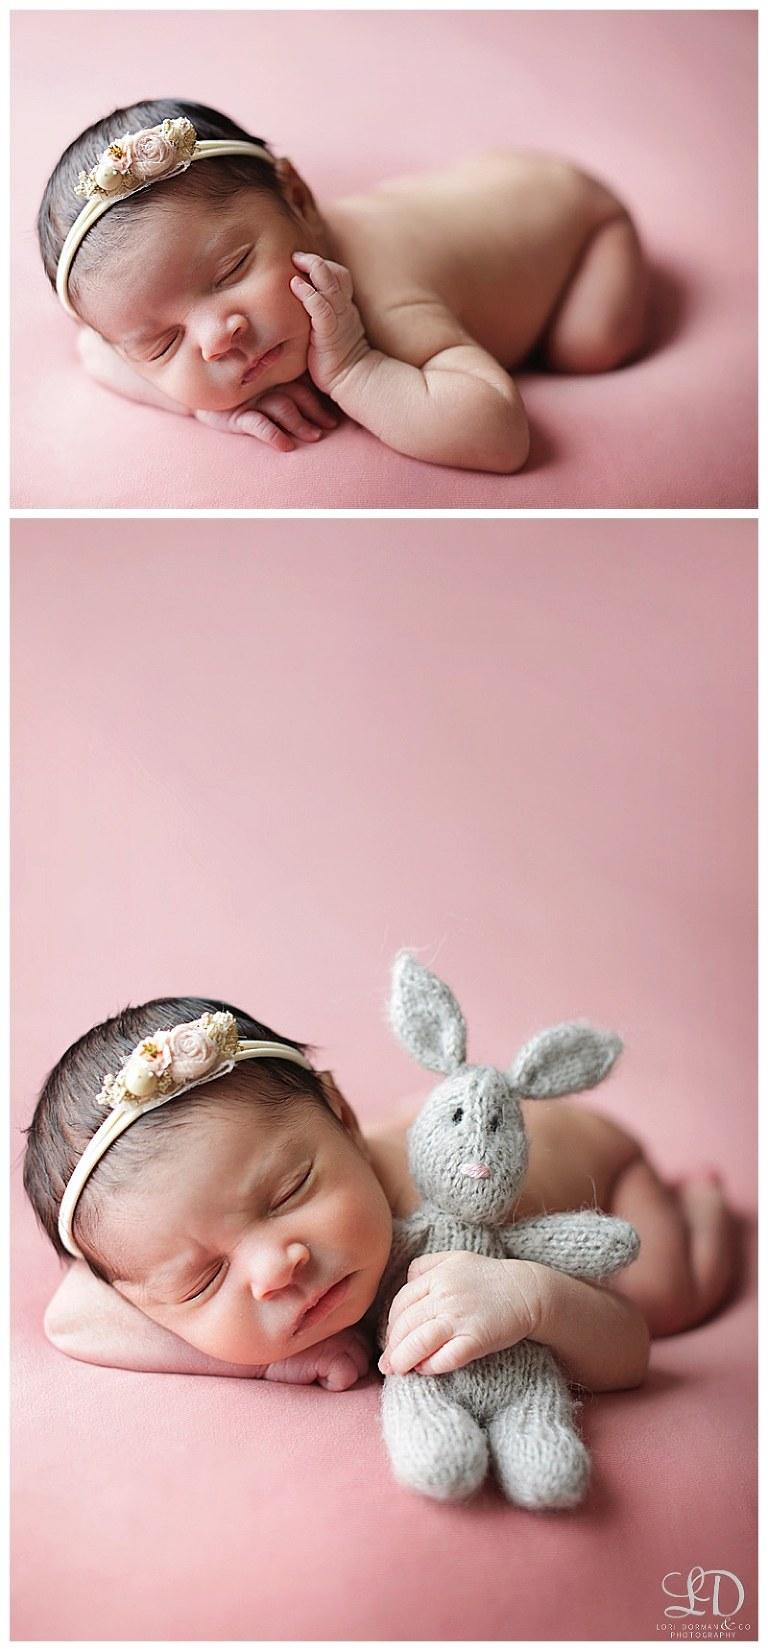 sweet maternity photoshoot-lori dorman photography-maternity boudoir-professional photographer_5315.jpg